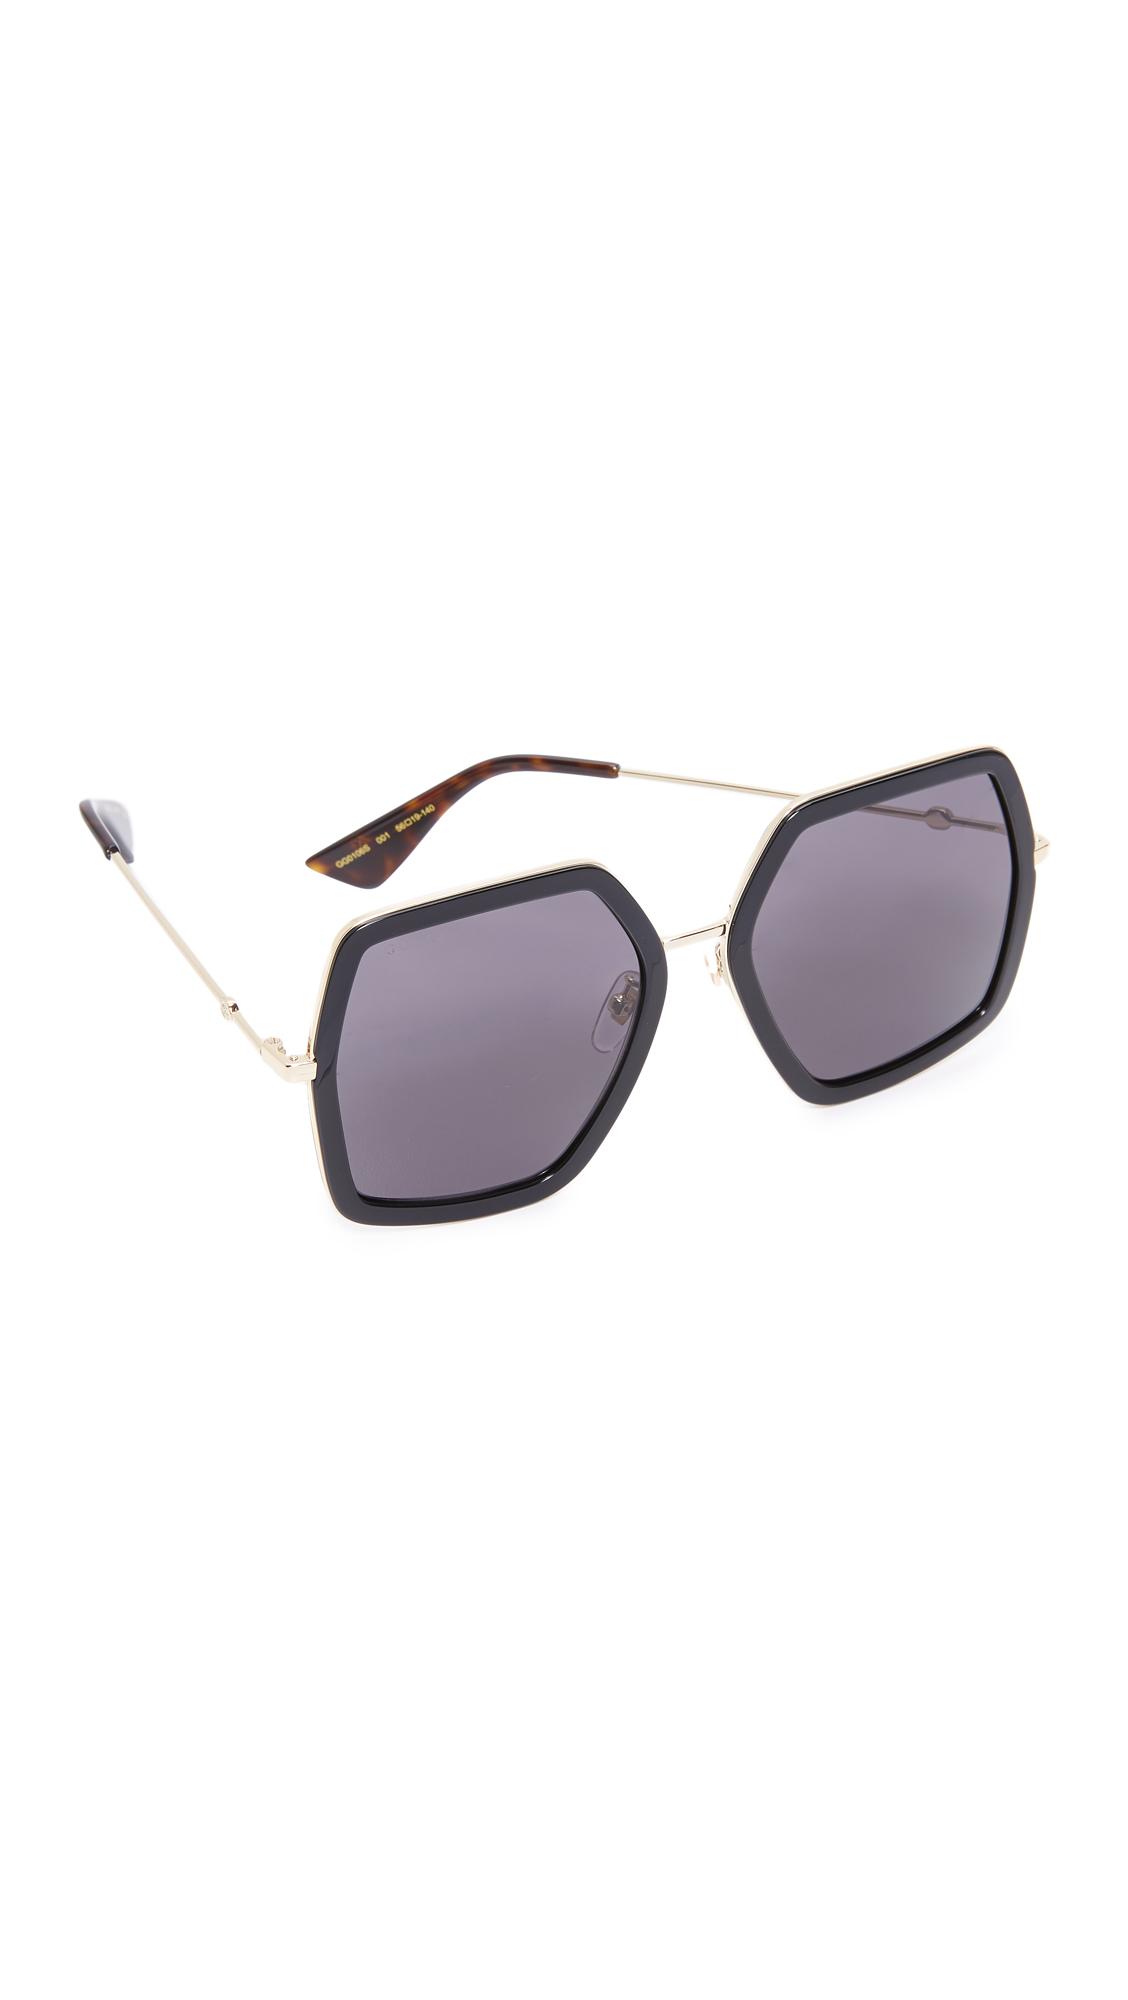 Gucci Urban Web Block Sunglasses - Black/Grey